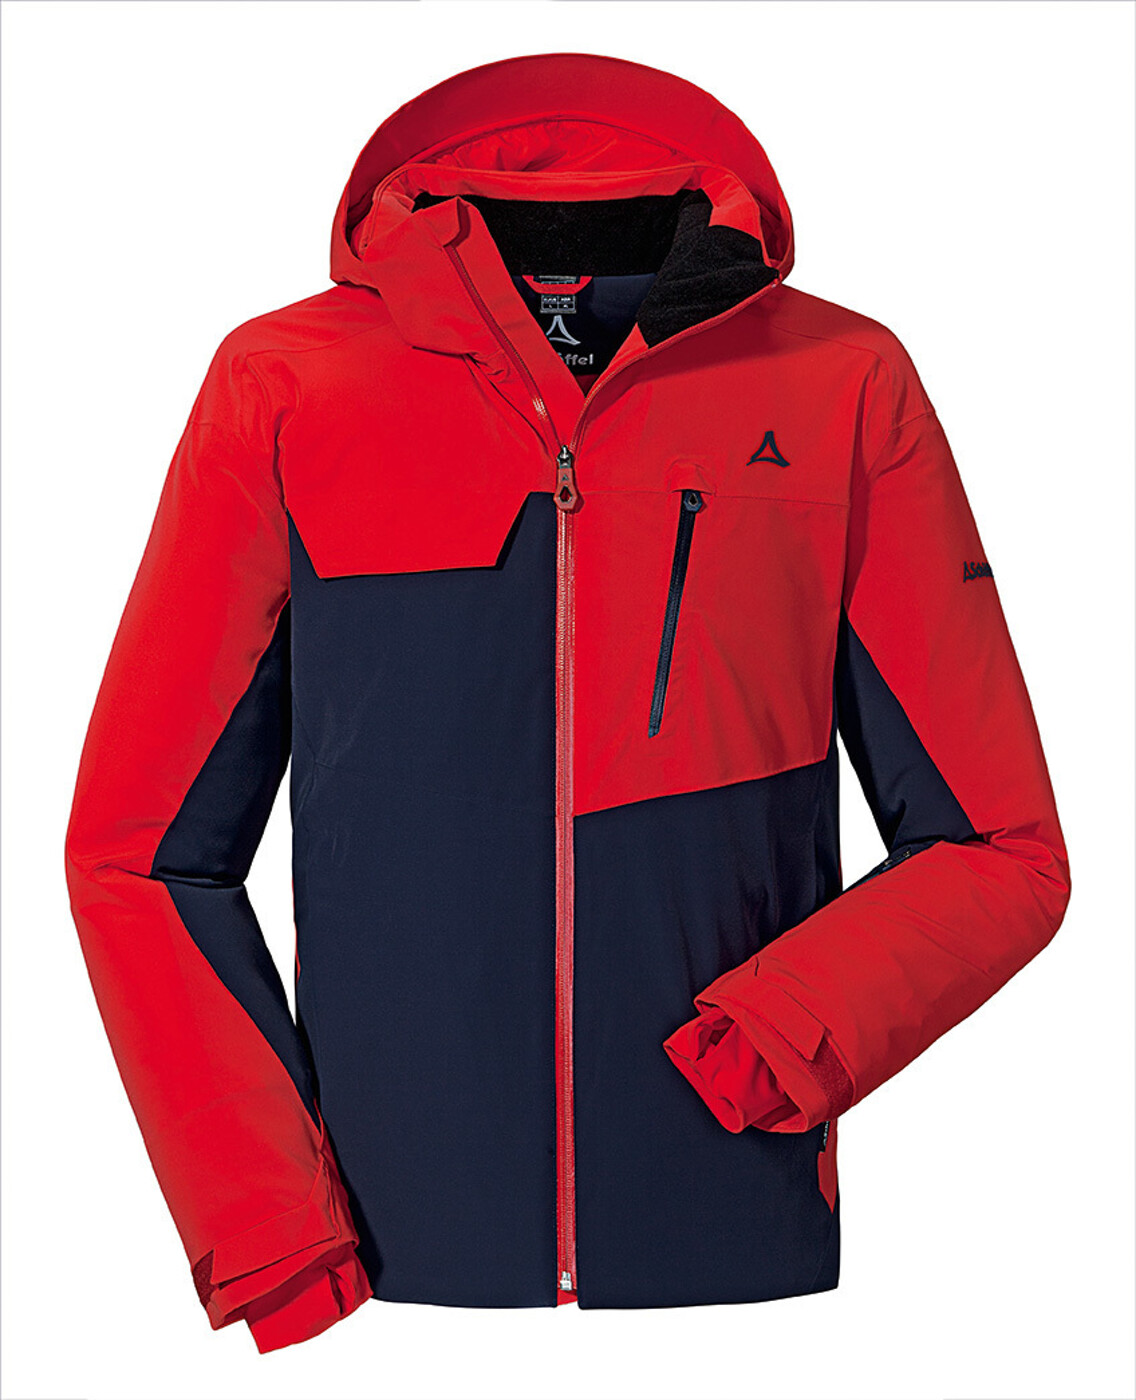 SCHÖFFEL Ski Jacket Arlberg2 - Herren